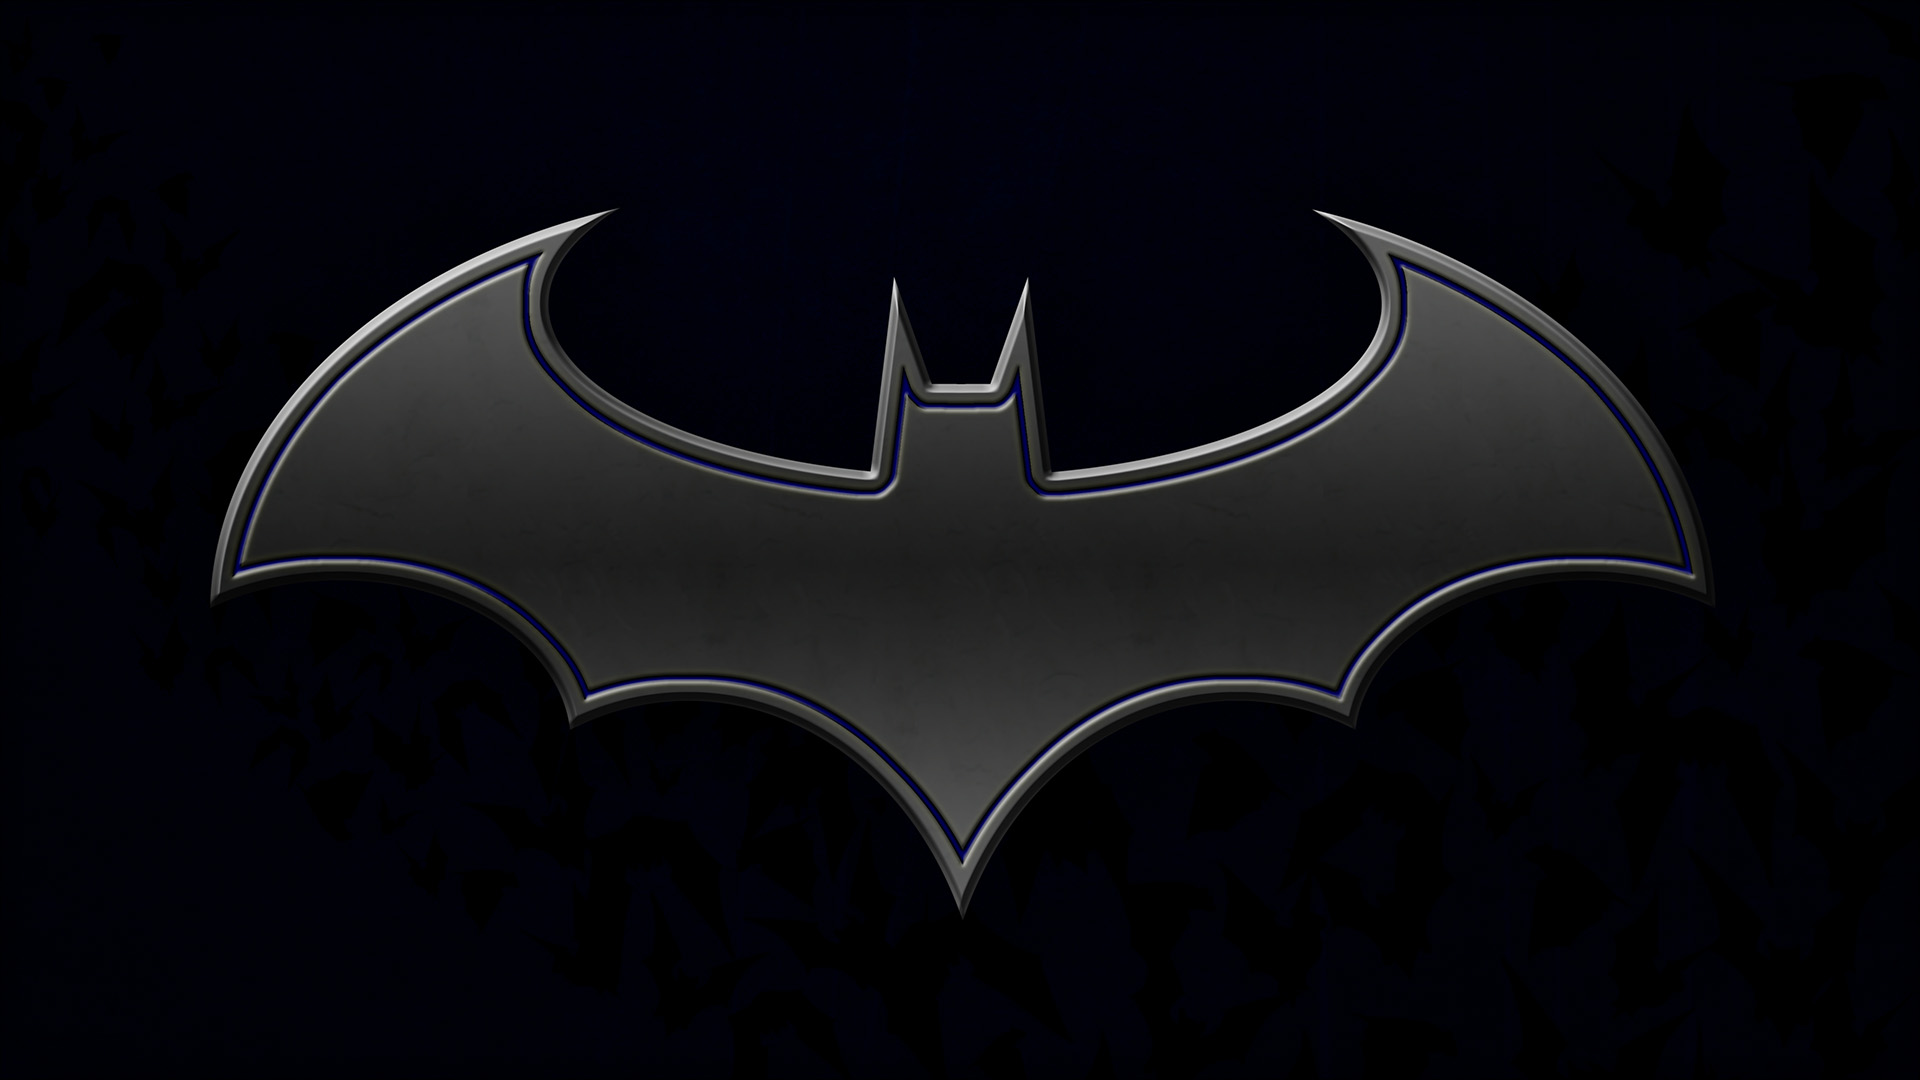 batman logo hd wallpaper FREE 4U WALLPAPERS 1920x1080